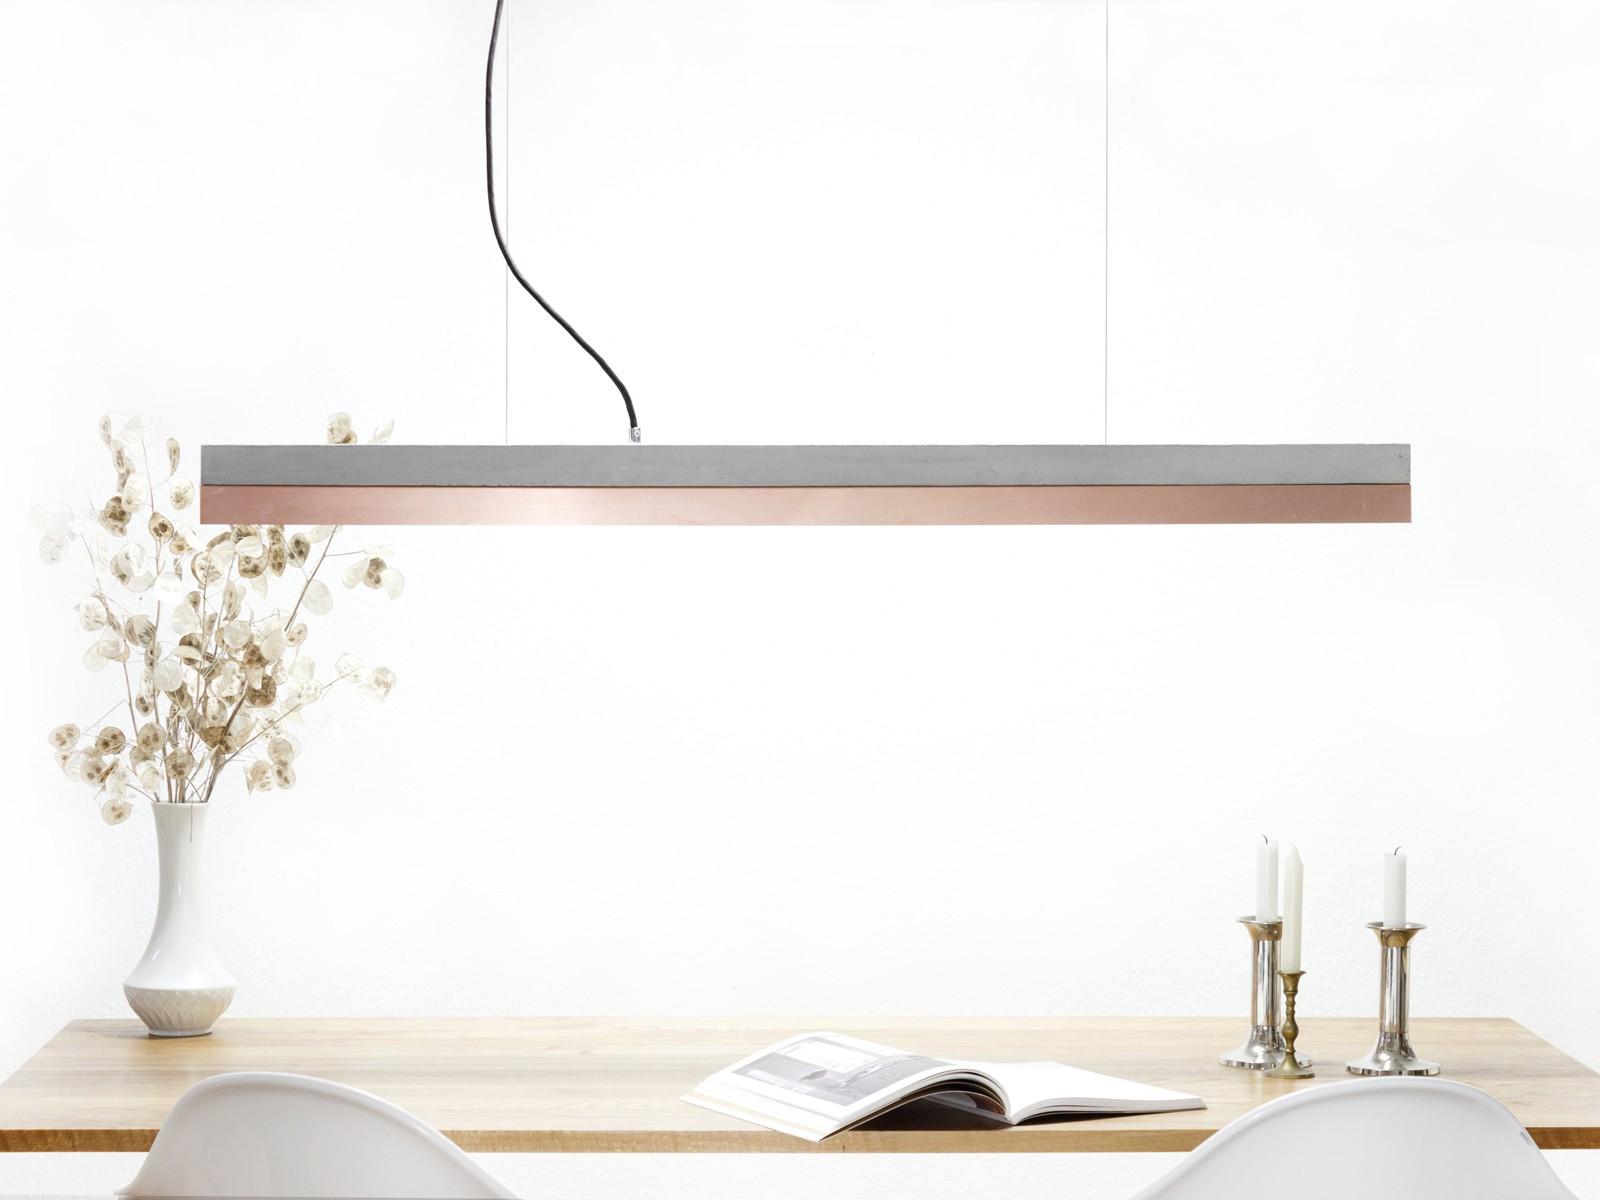 Buisverlichting- LED of TL verlichting?